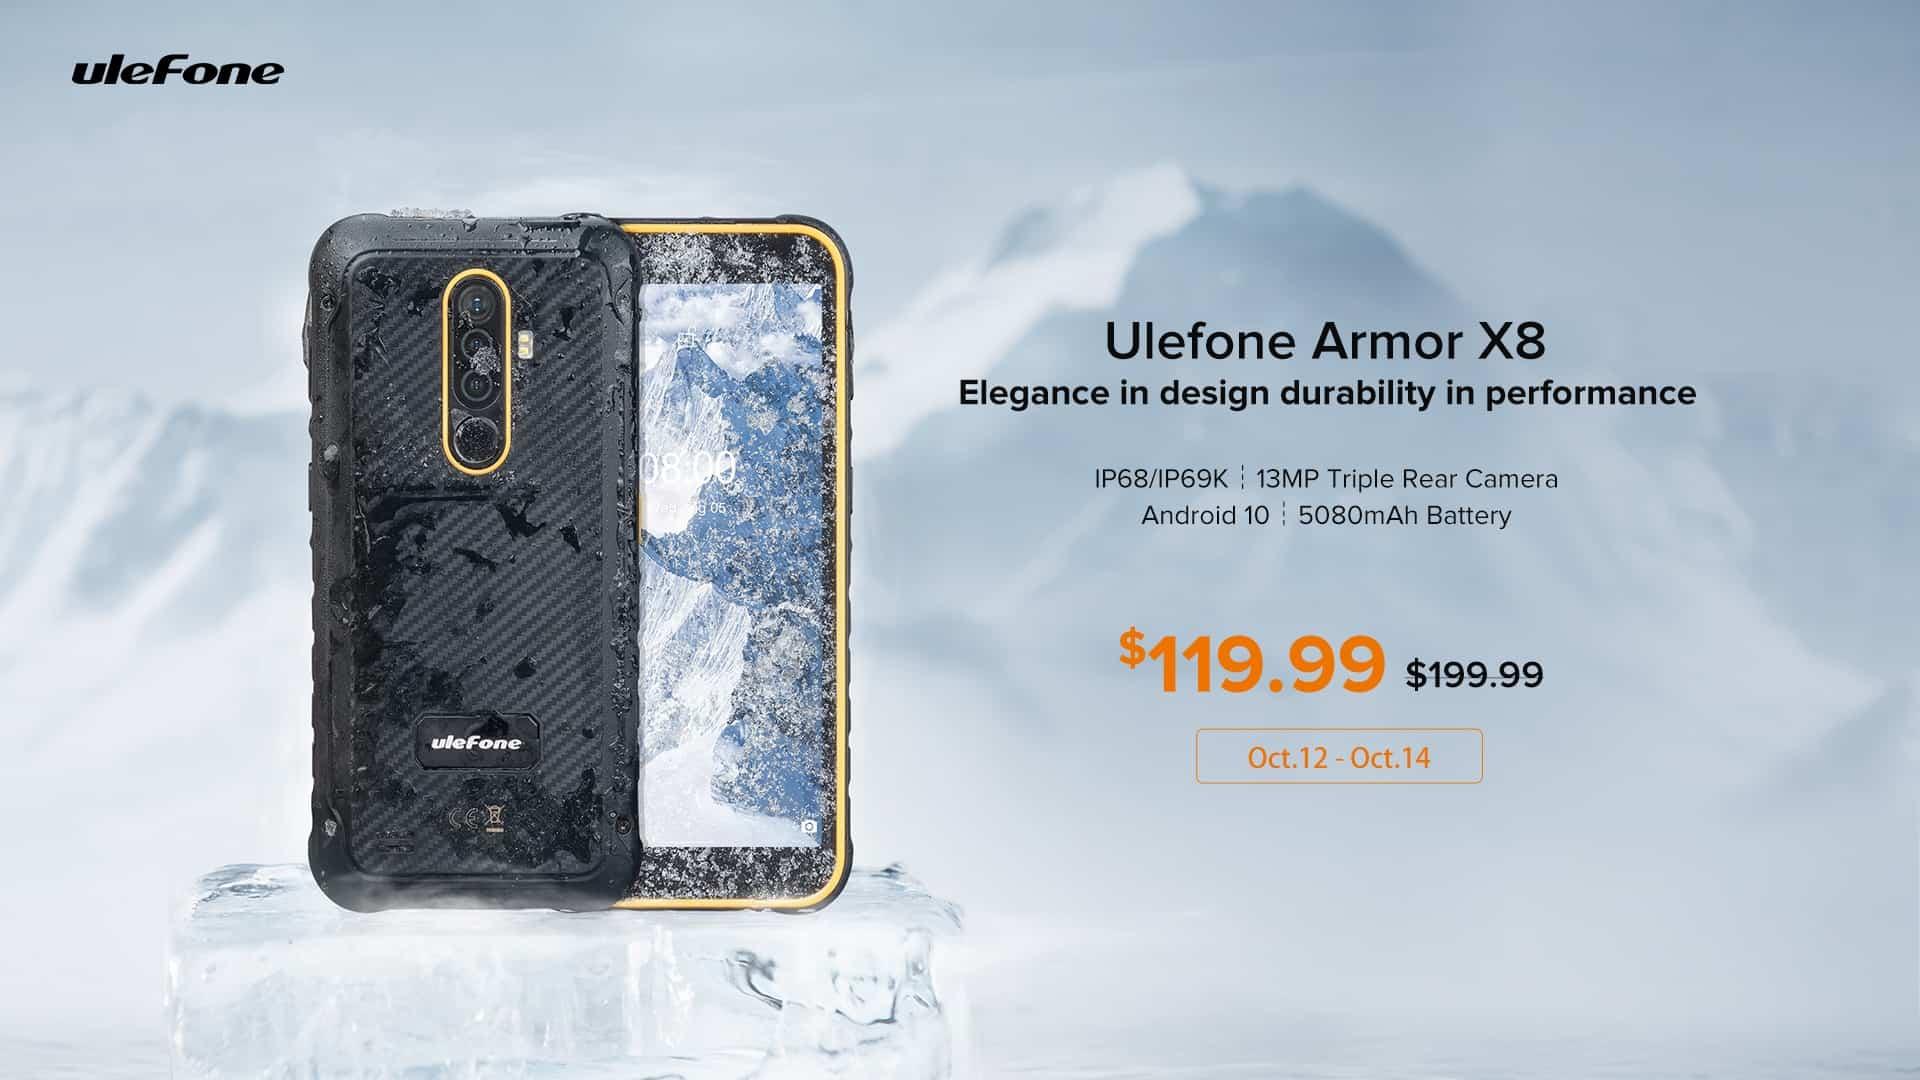 Ulefone Armor X8 image 35